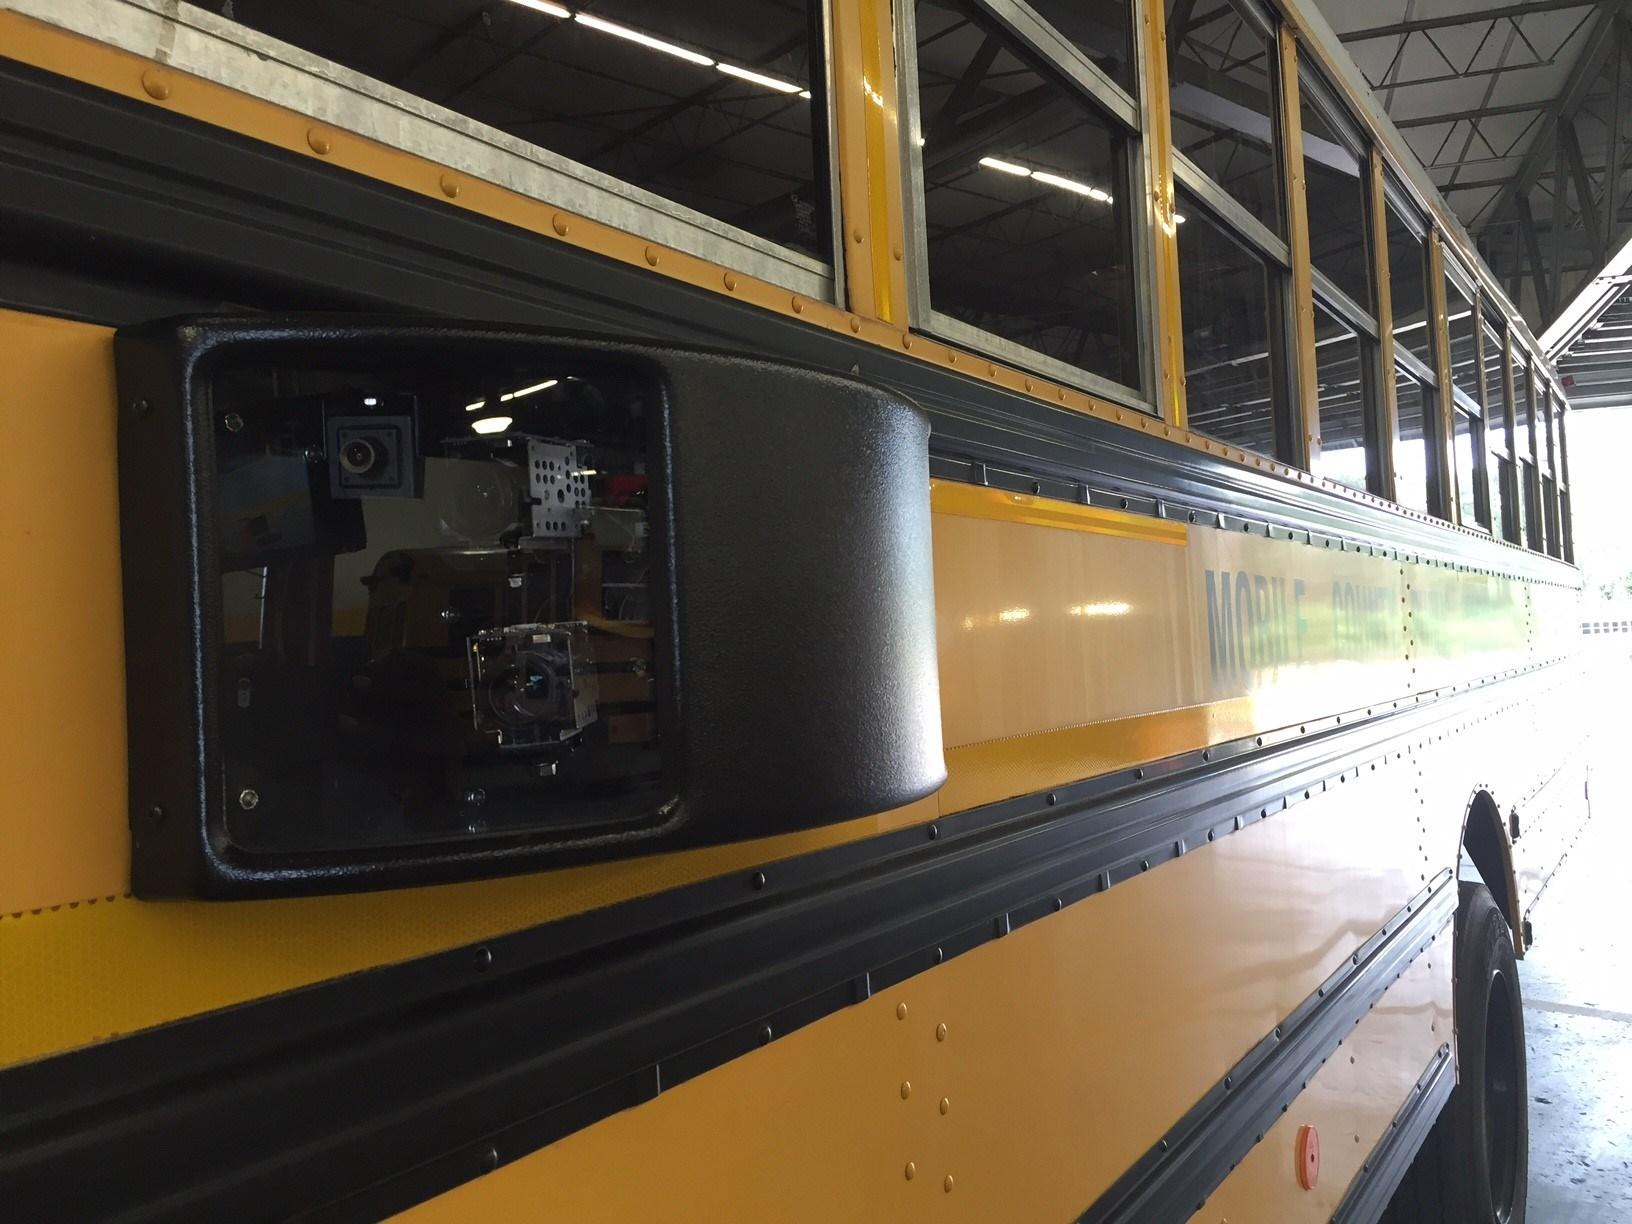 This week designated as National School Bus Safety Week